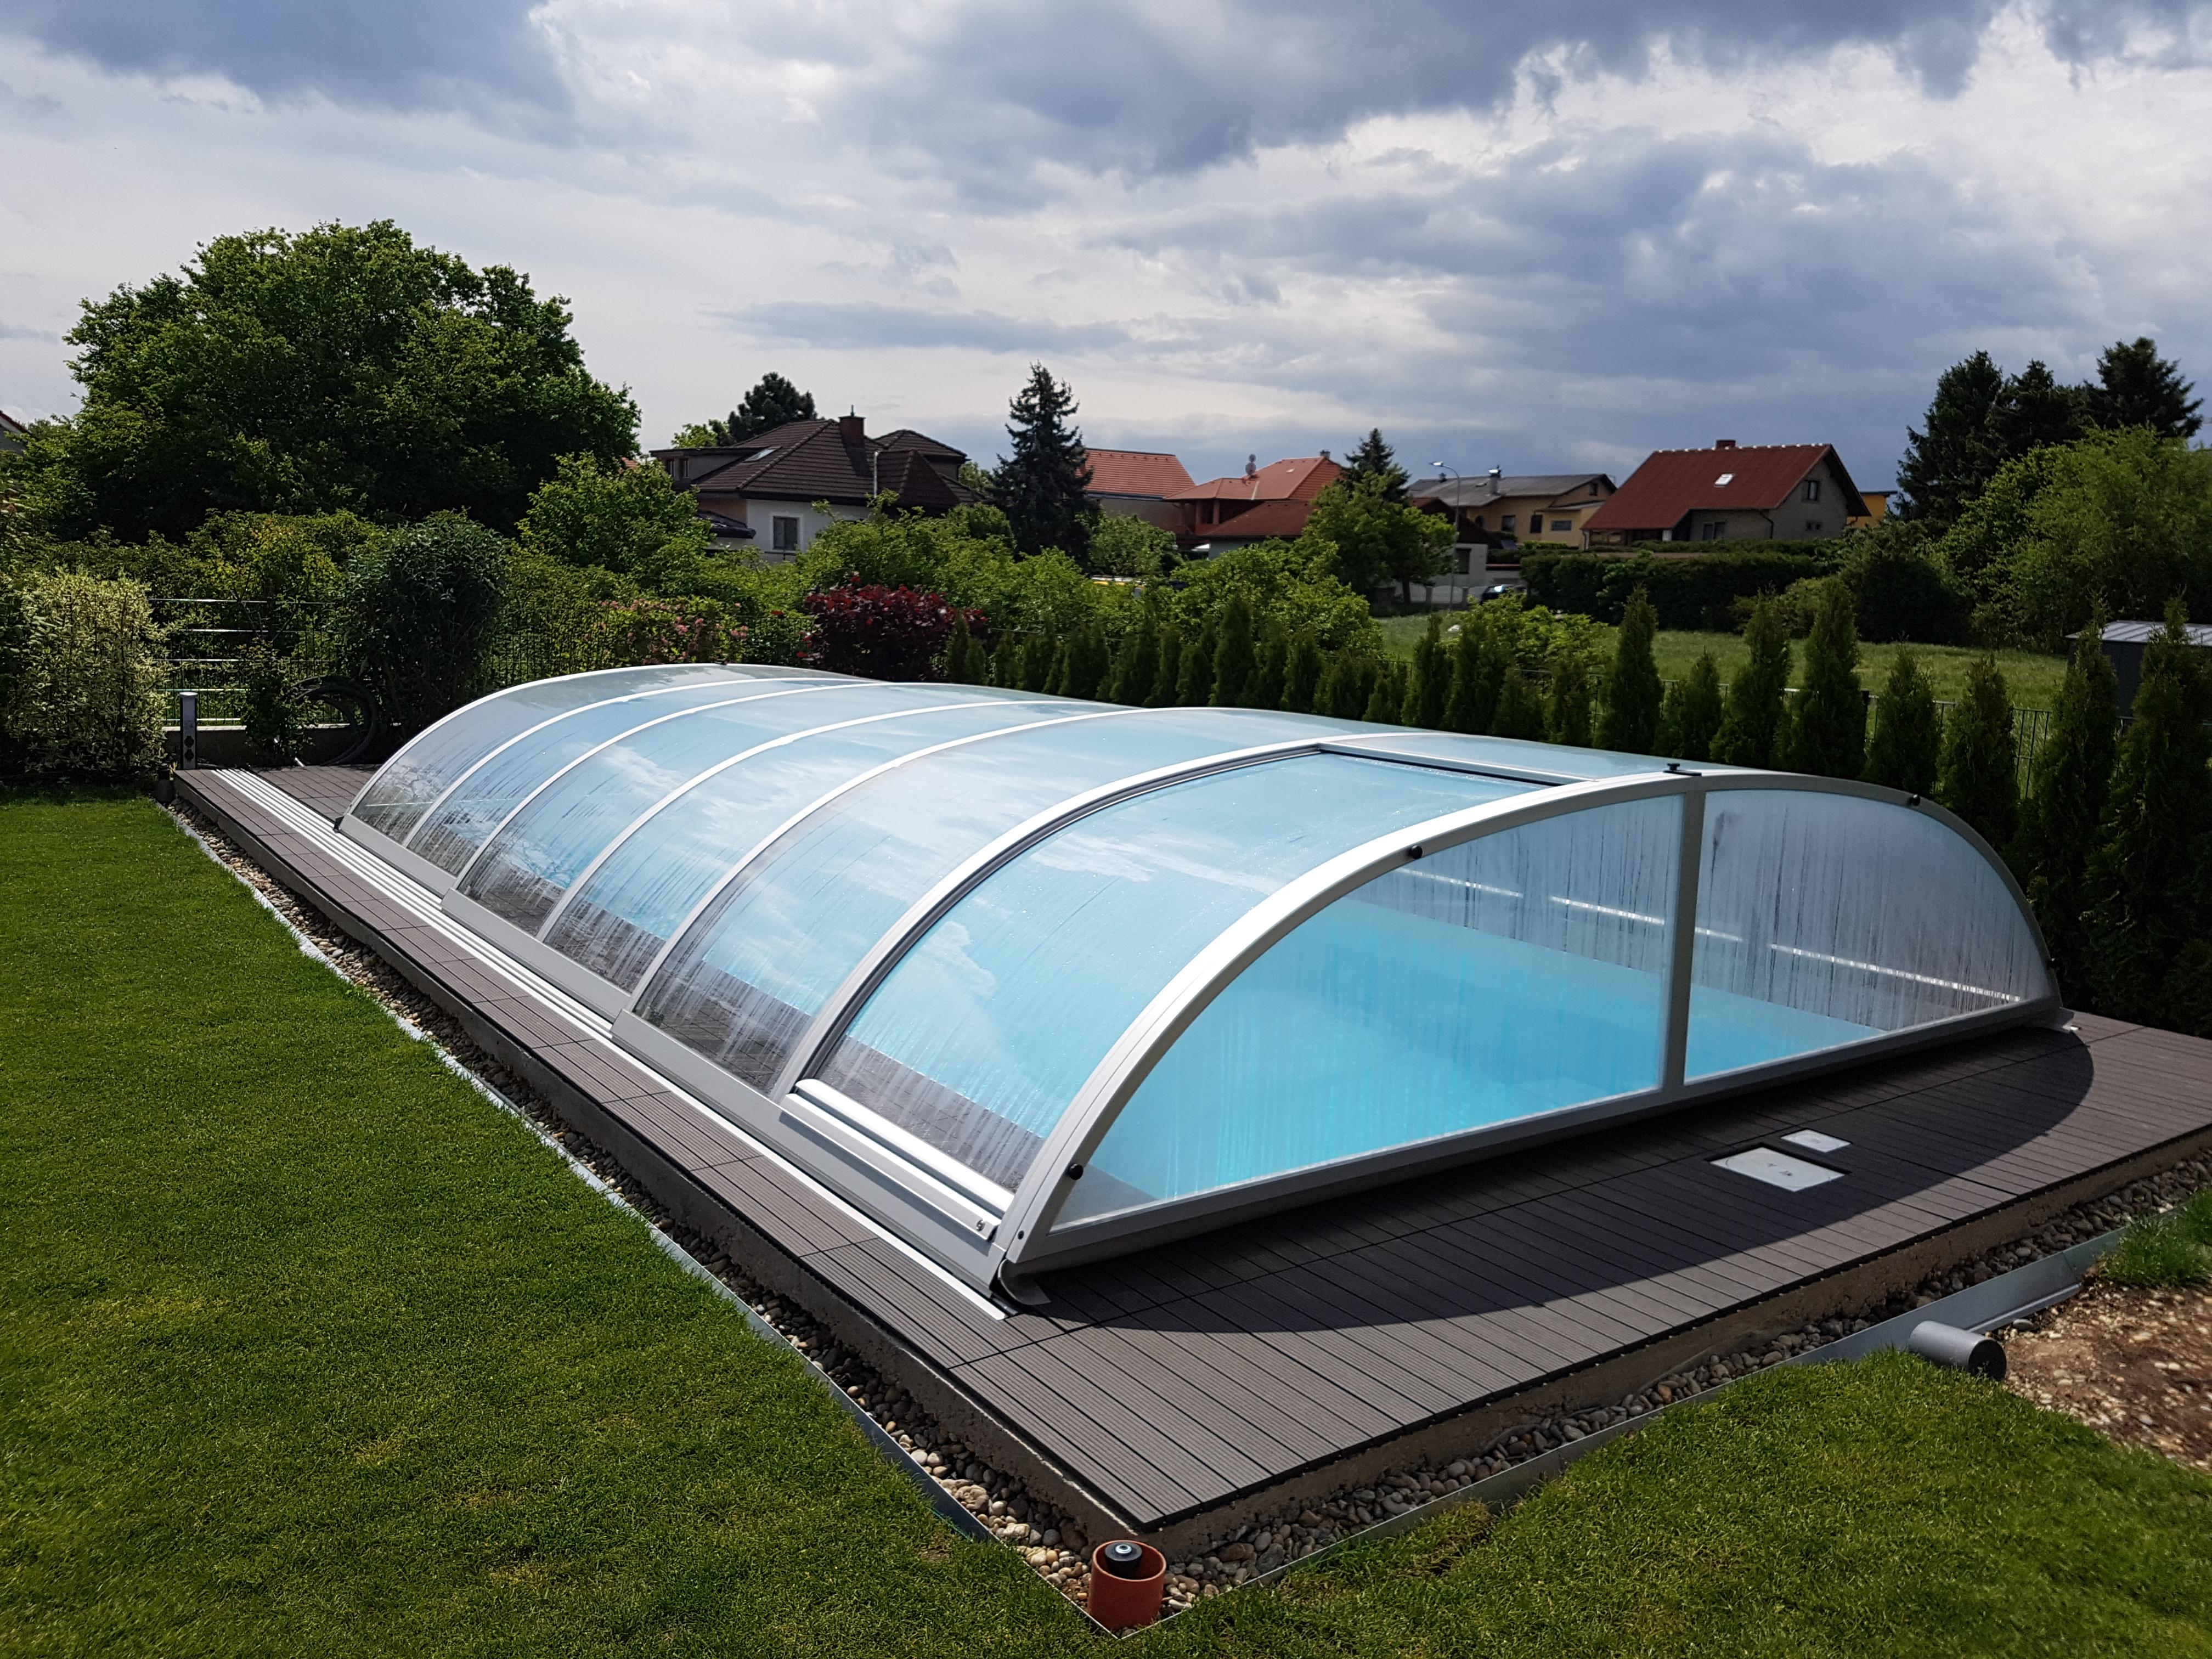 Muck pool ihr poolspezialist seit 1999 for Swimmingpool abverkauf